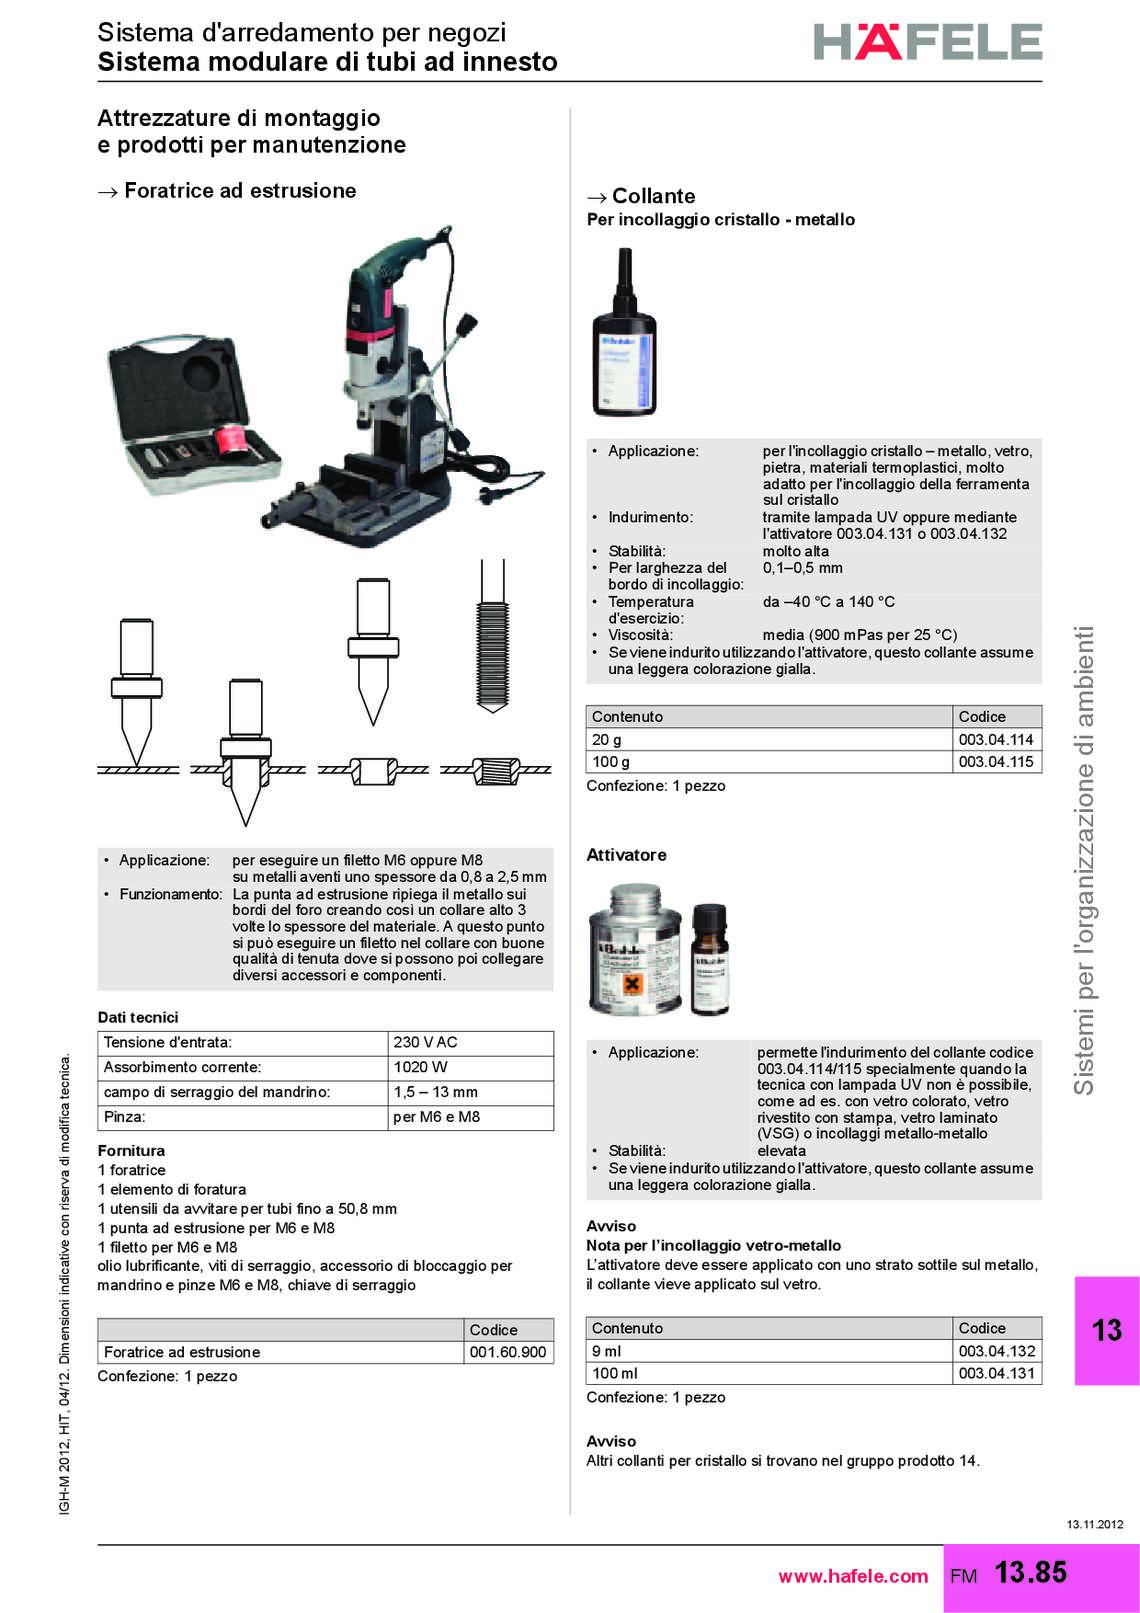 hafele-arredo-negozi-e-farmacie_32_096.jpg